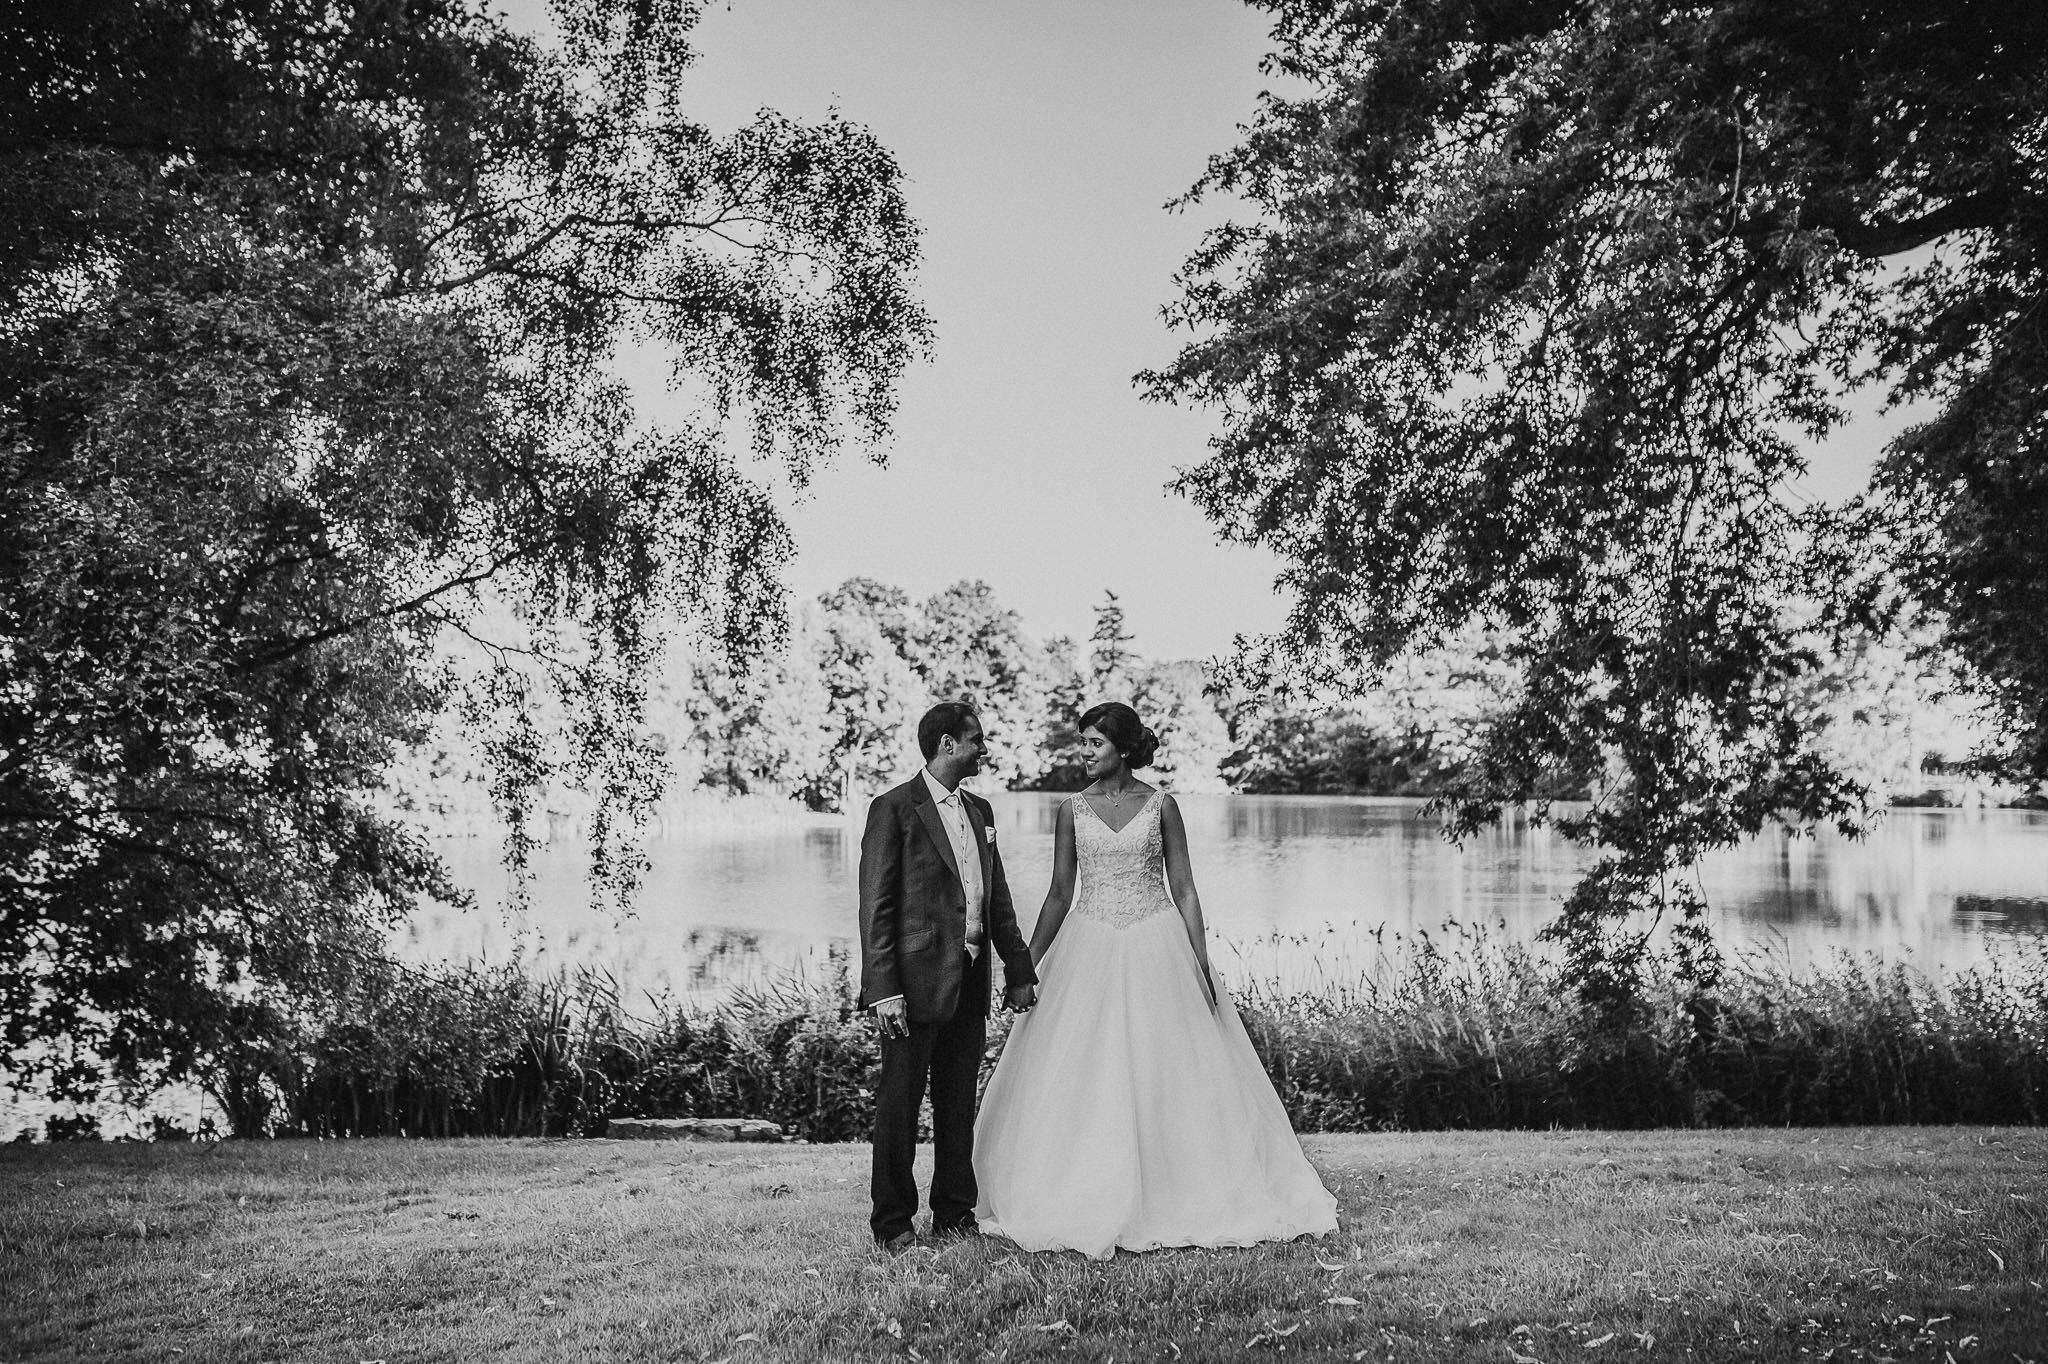 compton-verney-wedding-photos 24.jpg